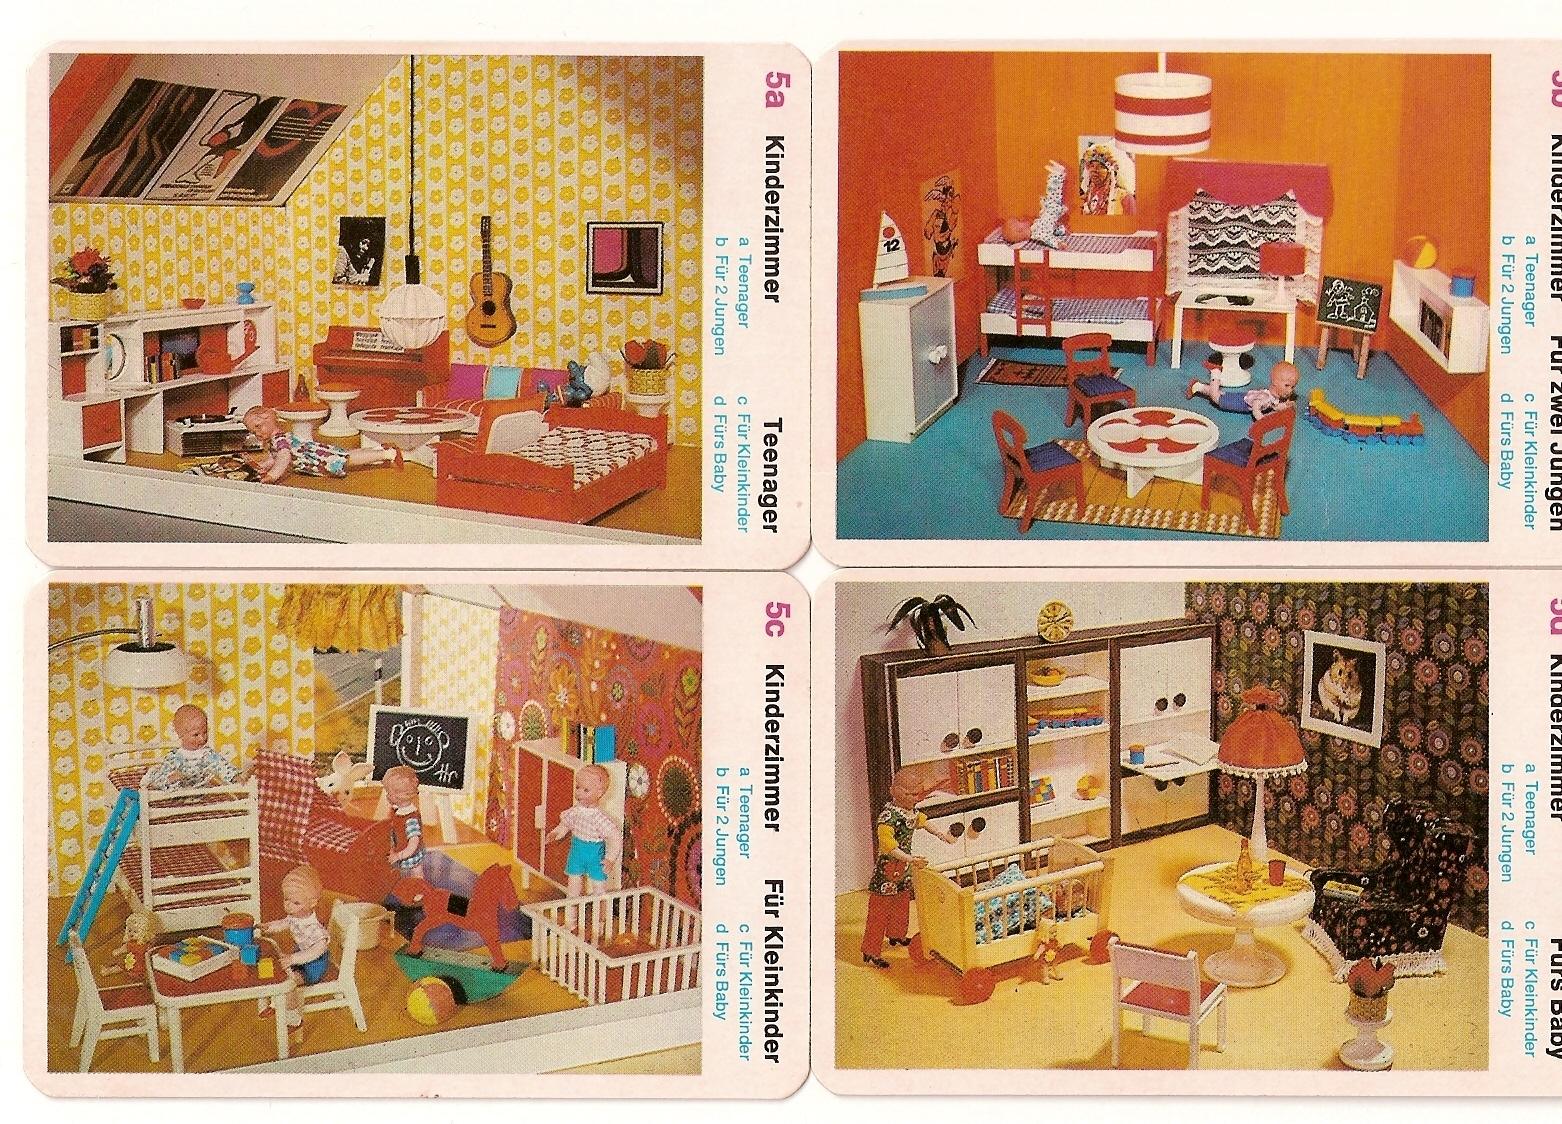 Diepuppenstubensammlerin kinderzimmer modella nurseries for Kinderzimmer 70er